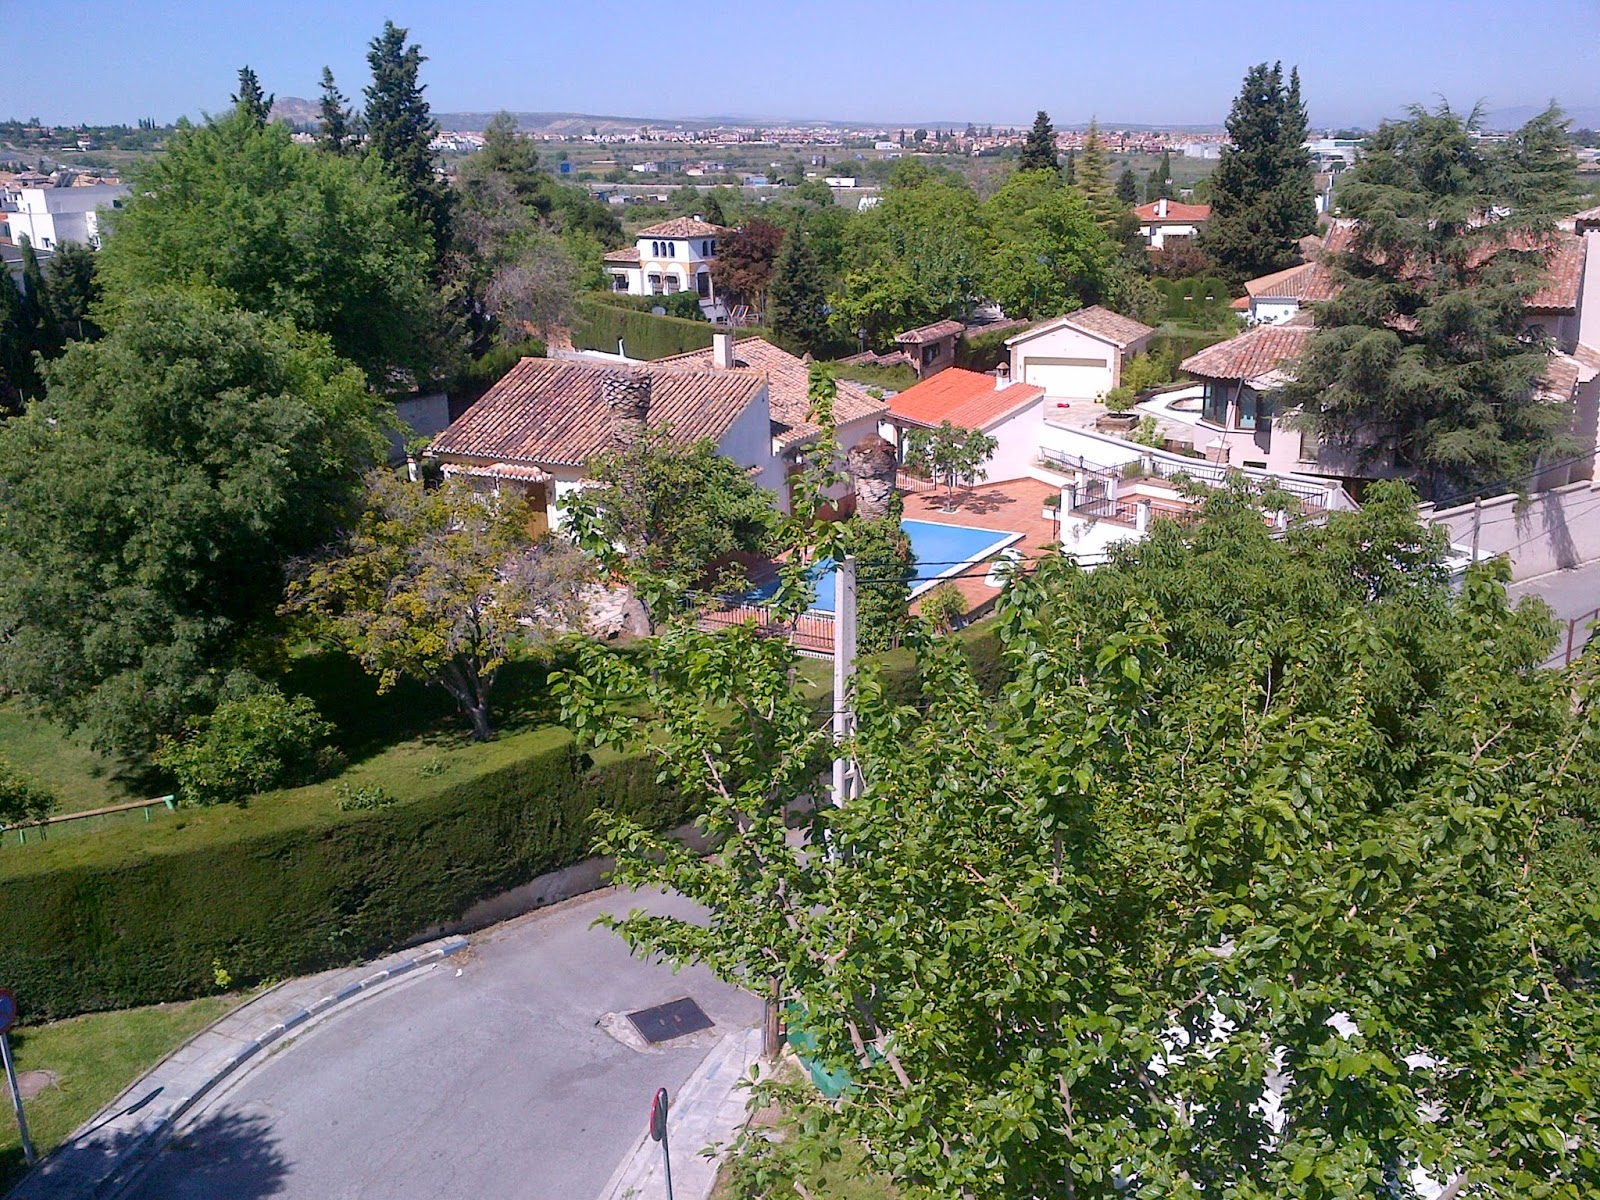 Parques y jardines de ogijares jardines avd andaluc a - Jardines de andalucia ...